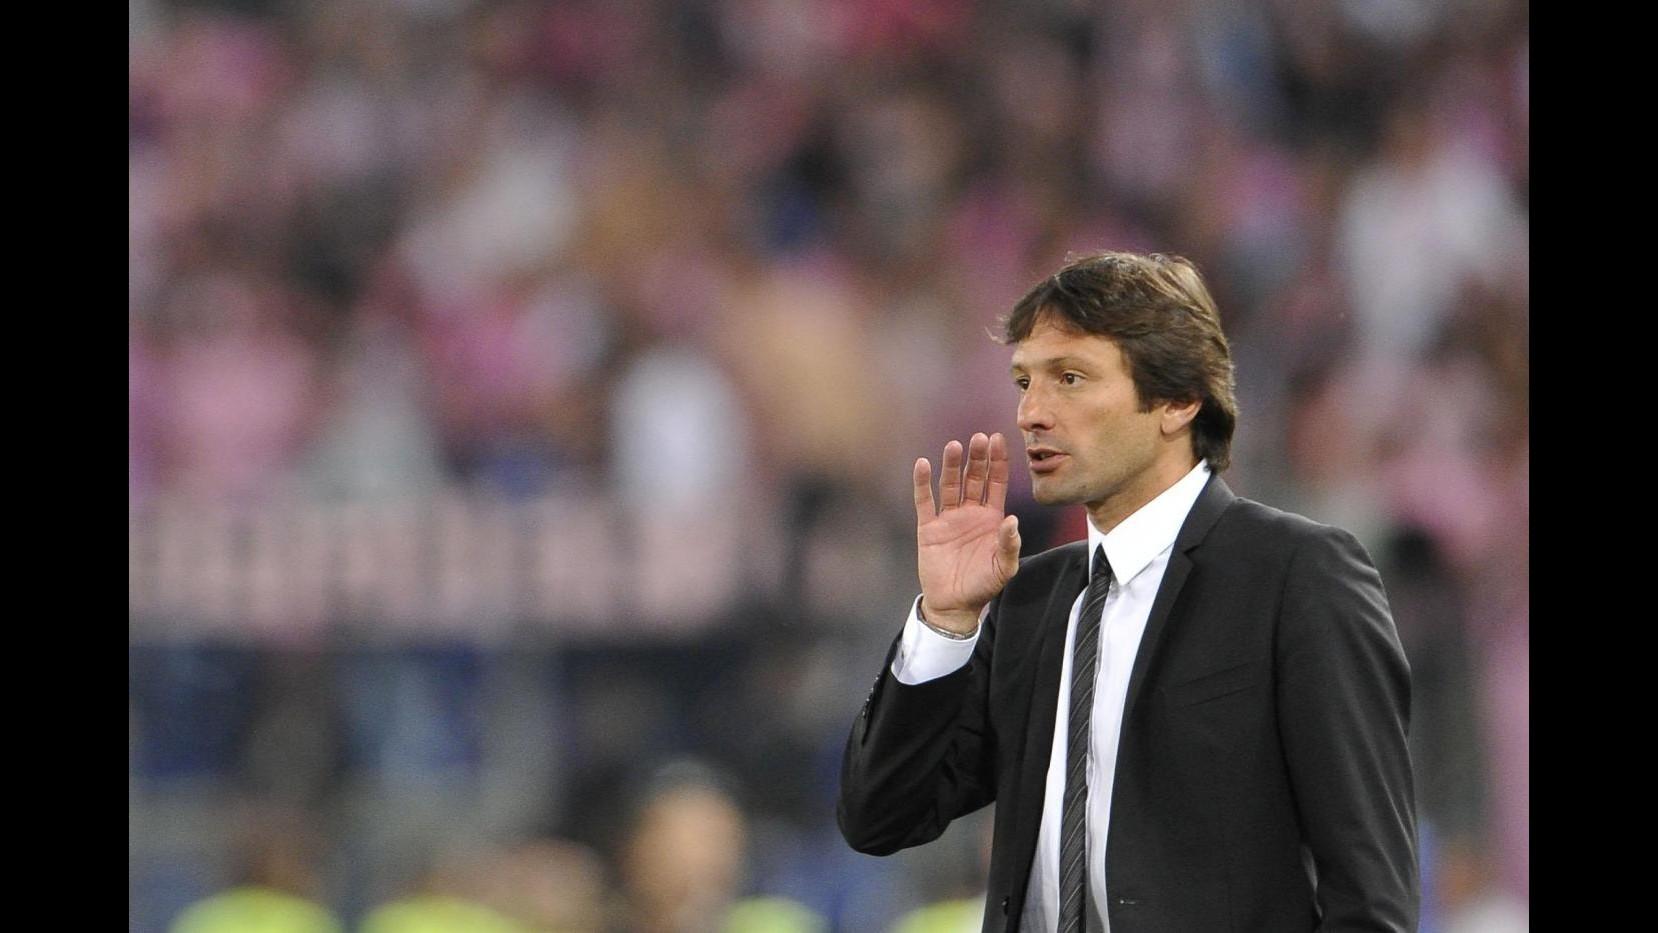 Calcio, Leonardo a Doha per incontro con Paris Saint Germain